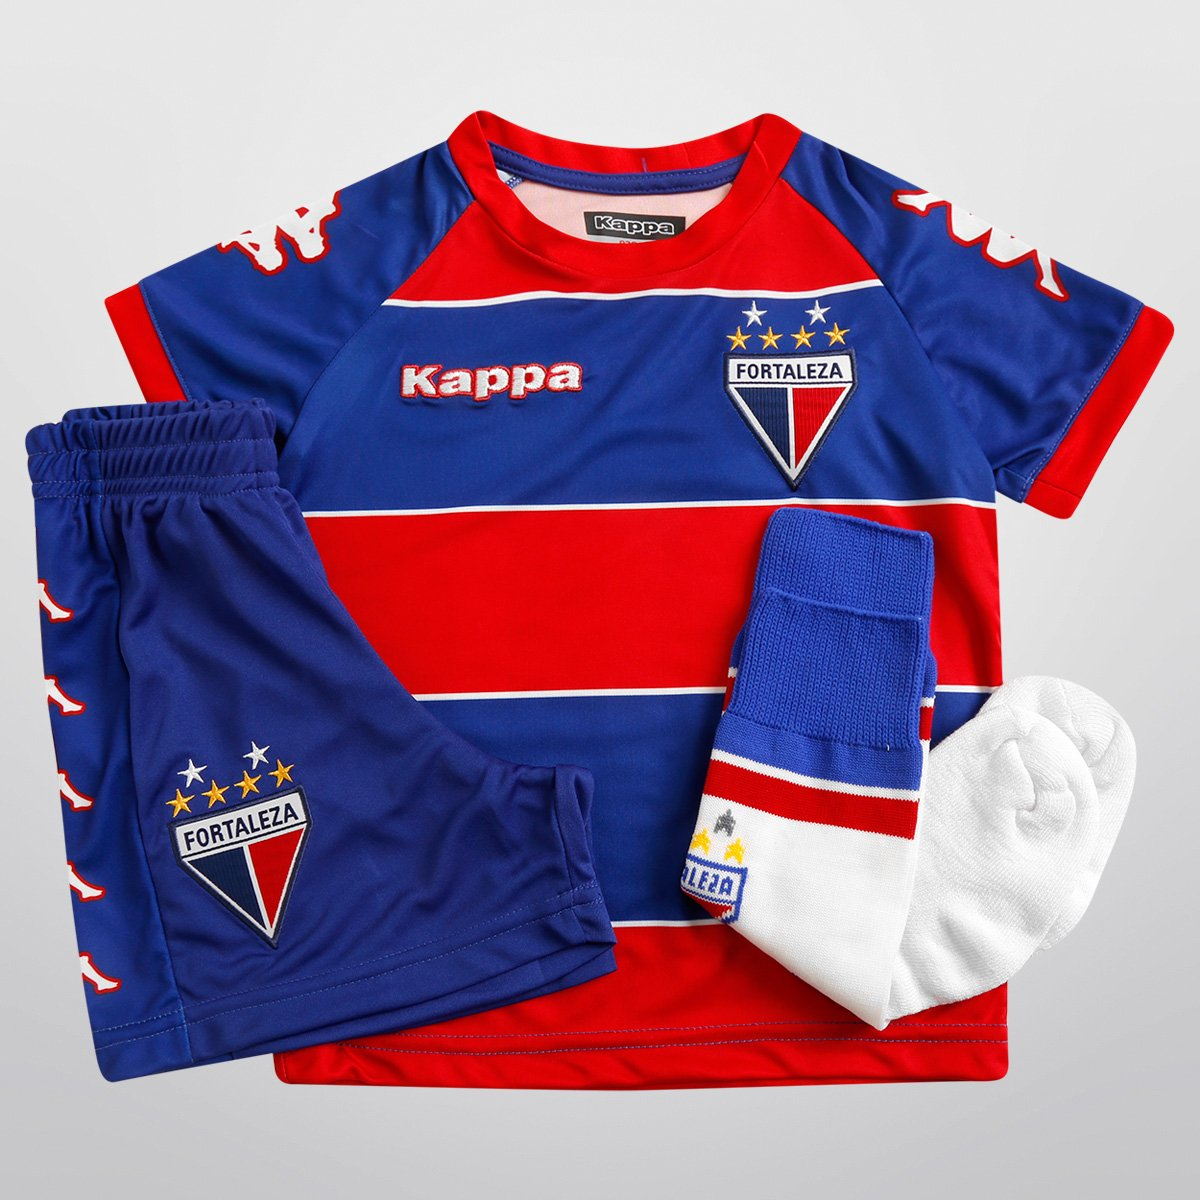 Kit Kappa Fortaleza I 2015 Infantil - Compre Agora  4c9a9a274990c